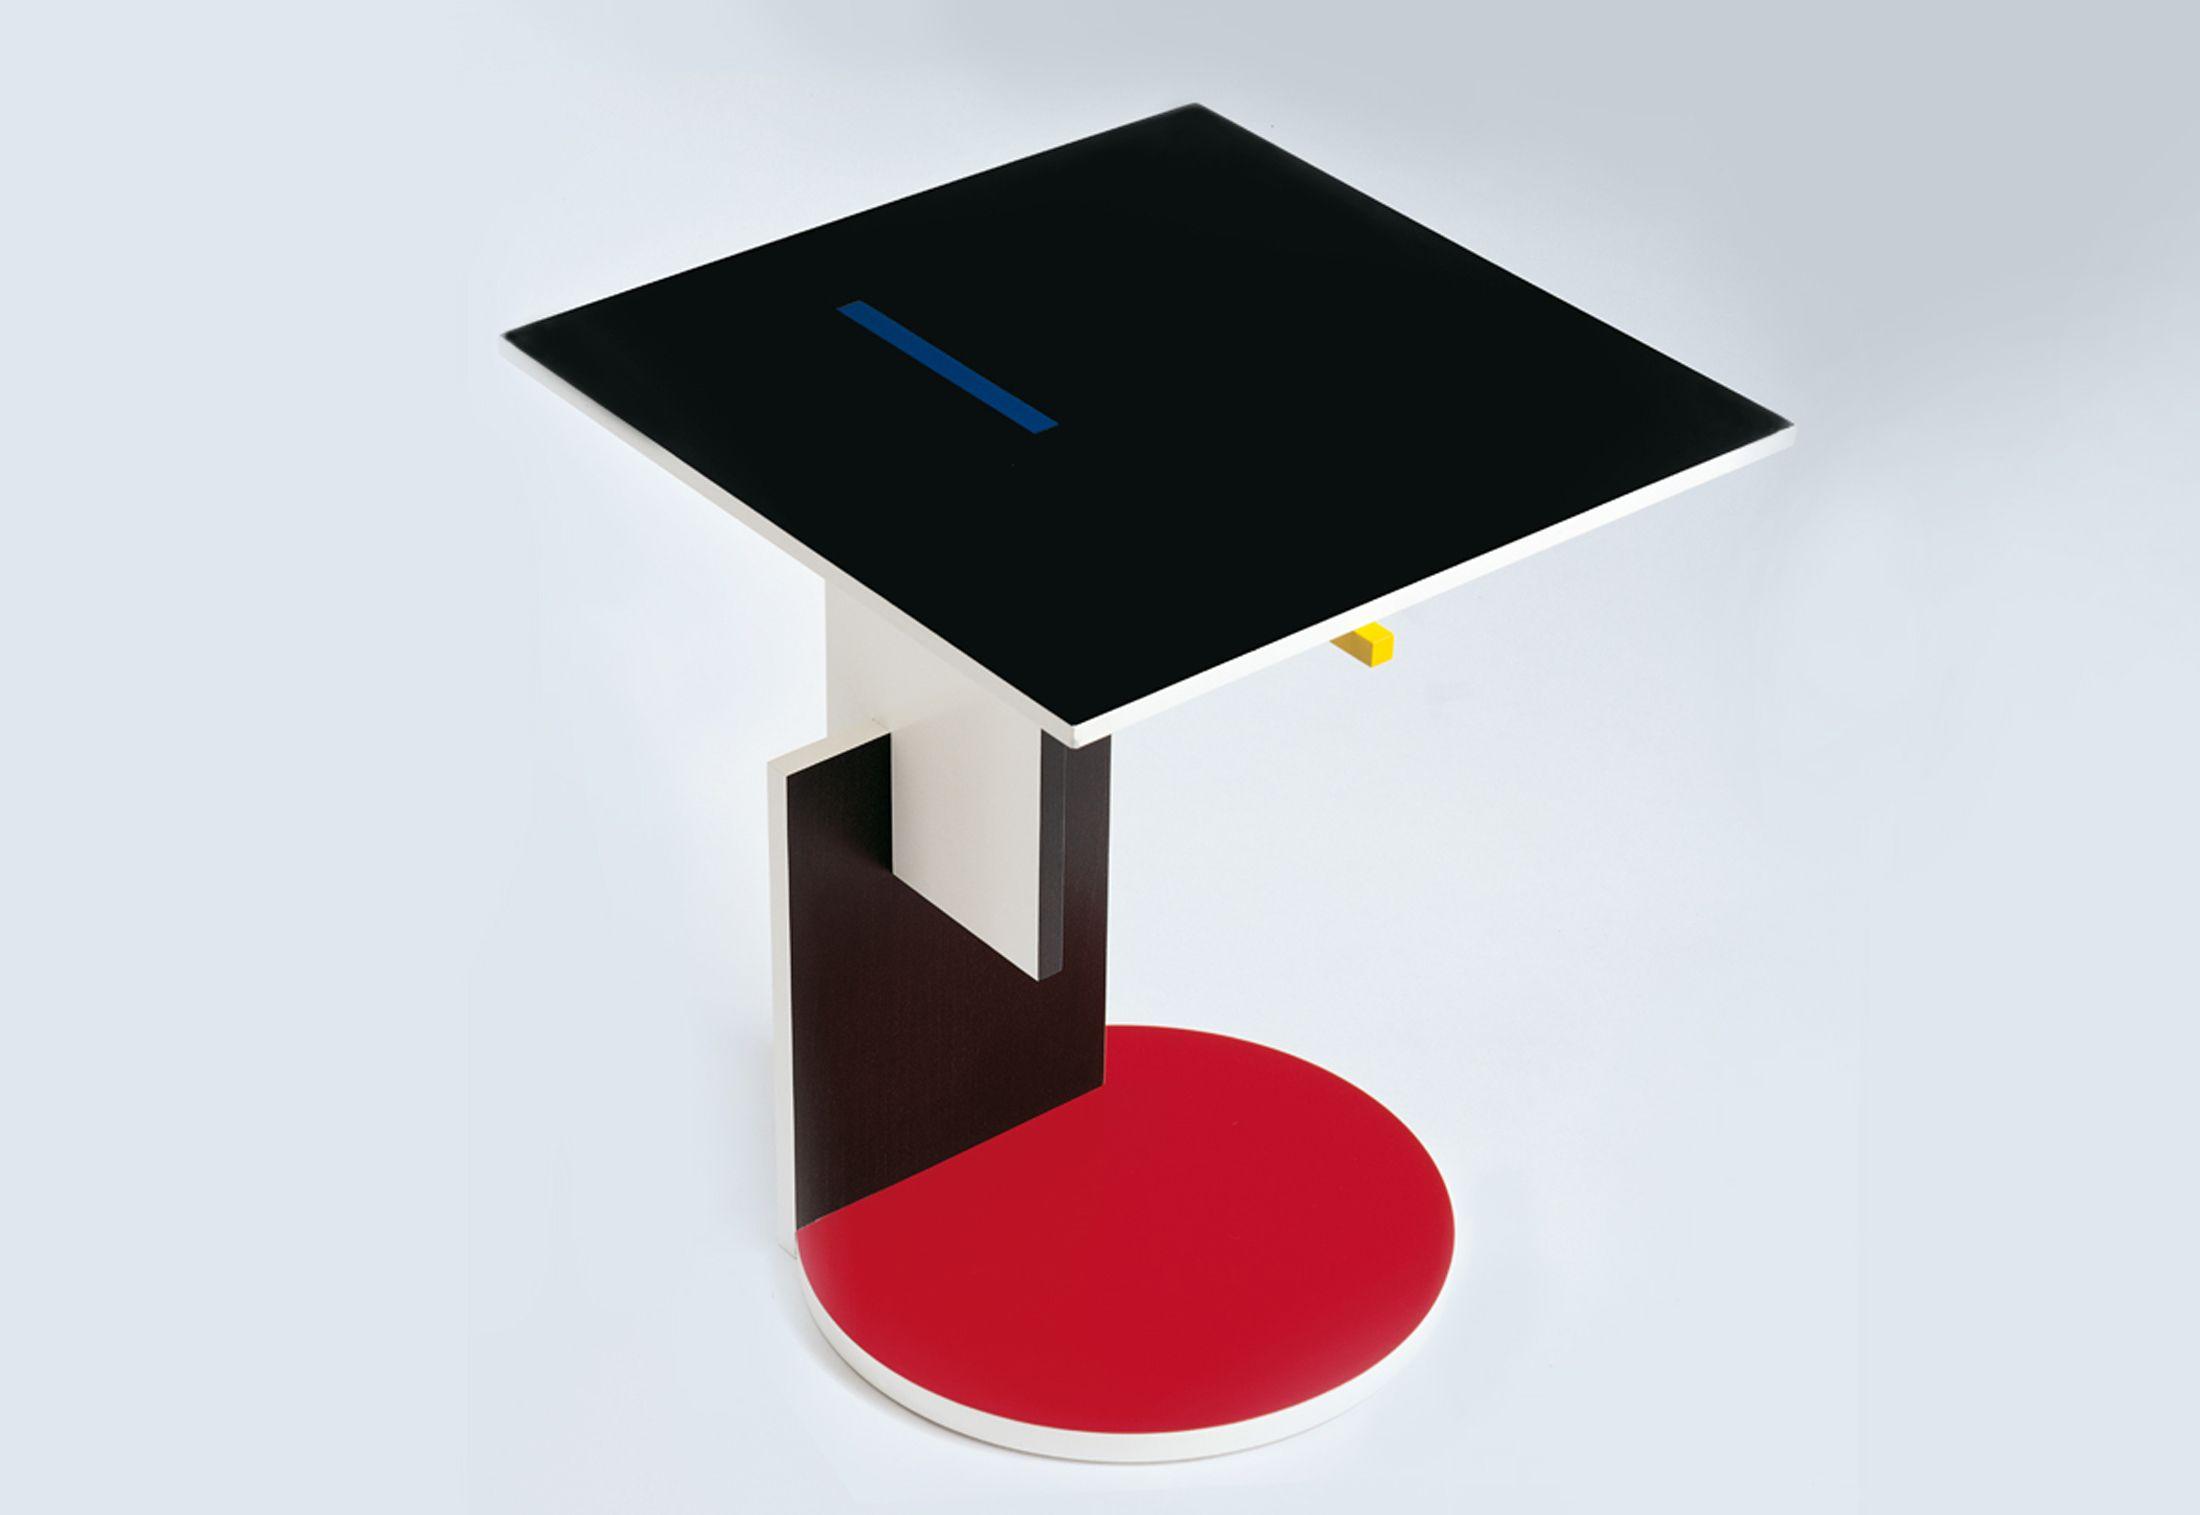 Cassina Schroeder Gerrit Rietveld